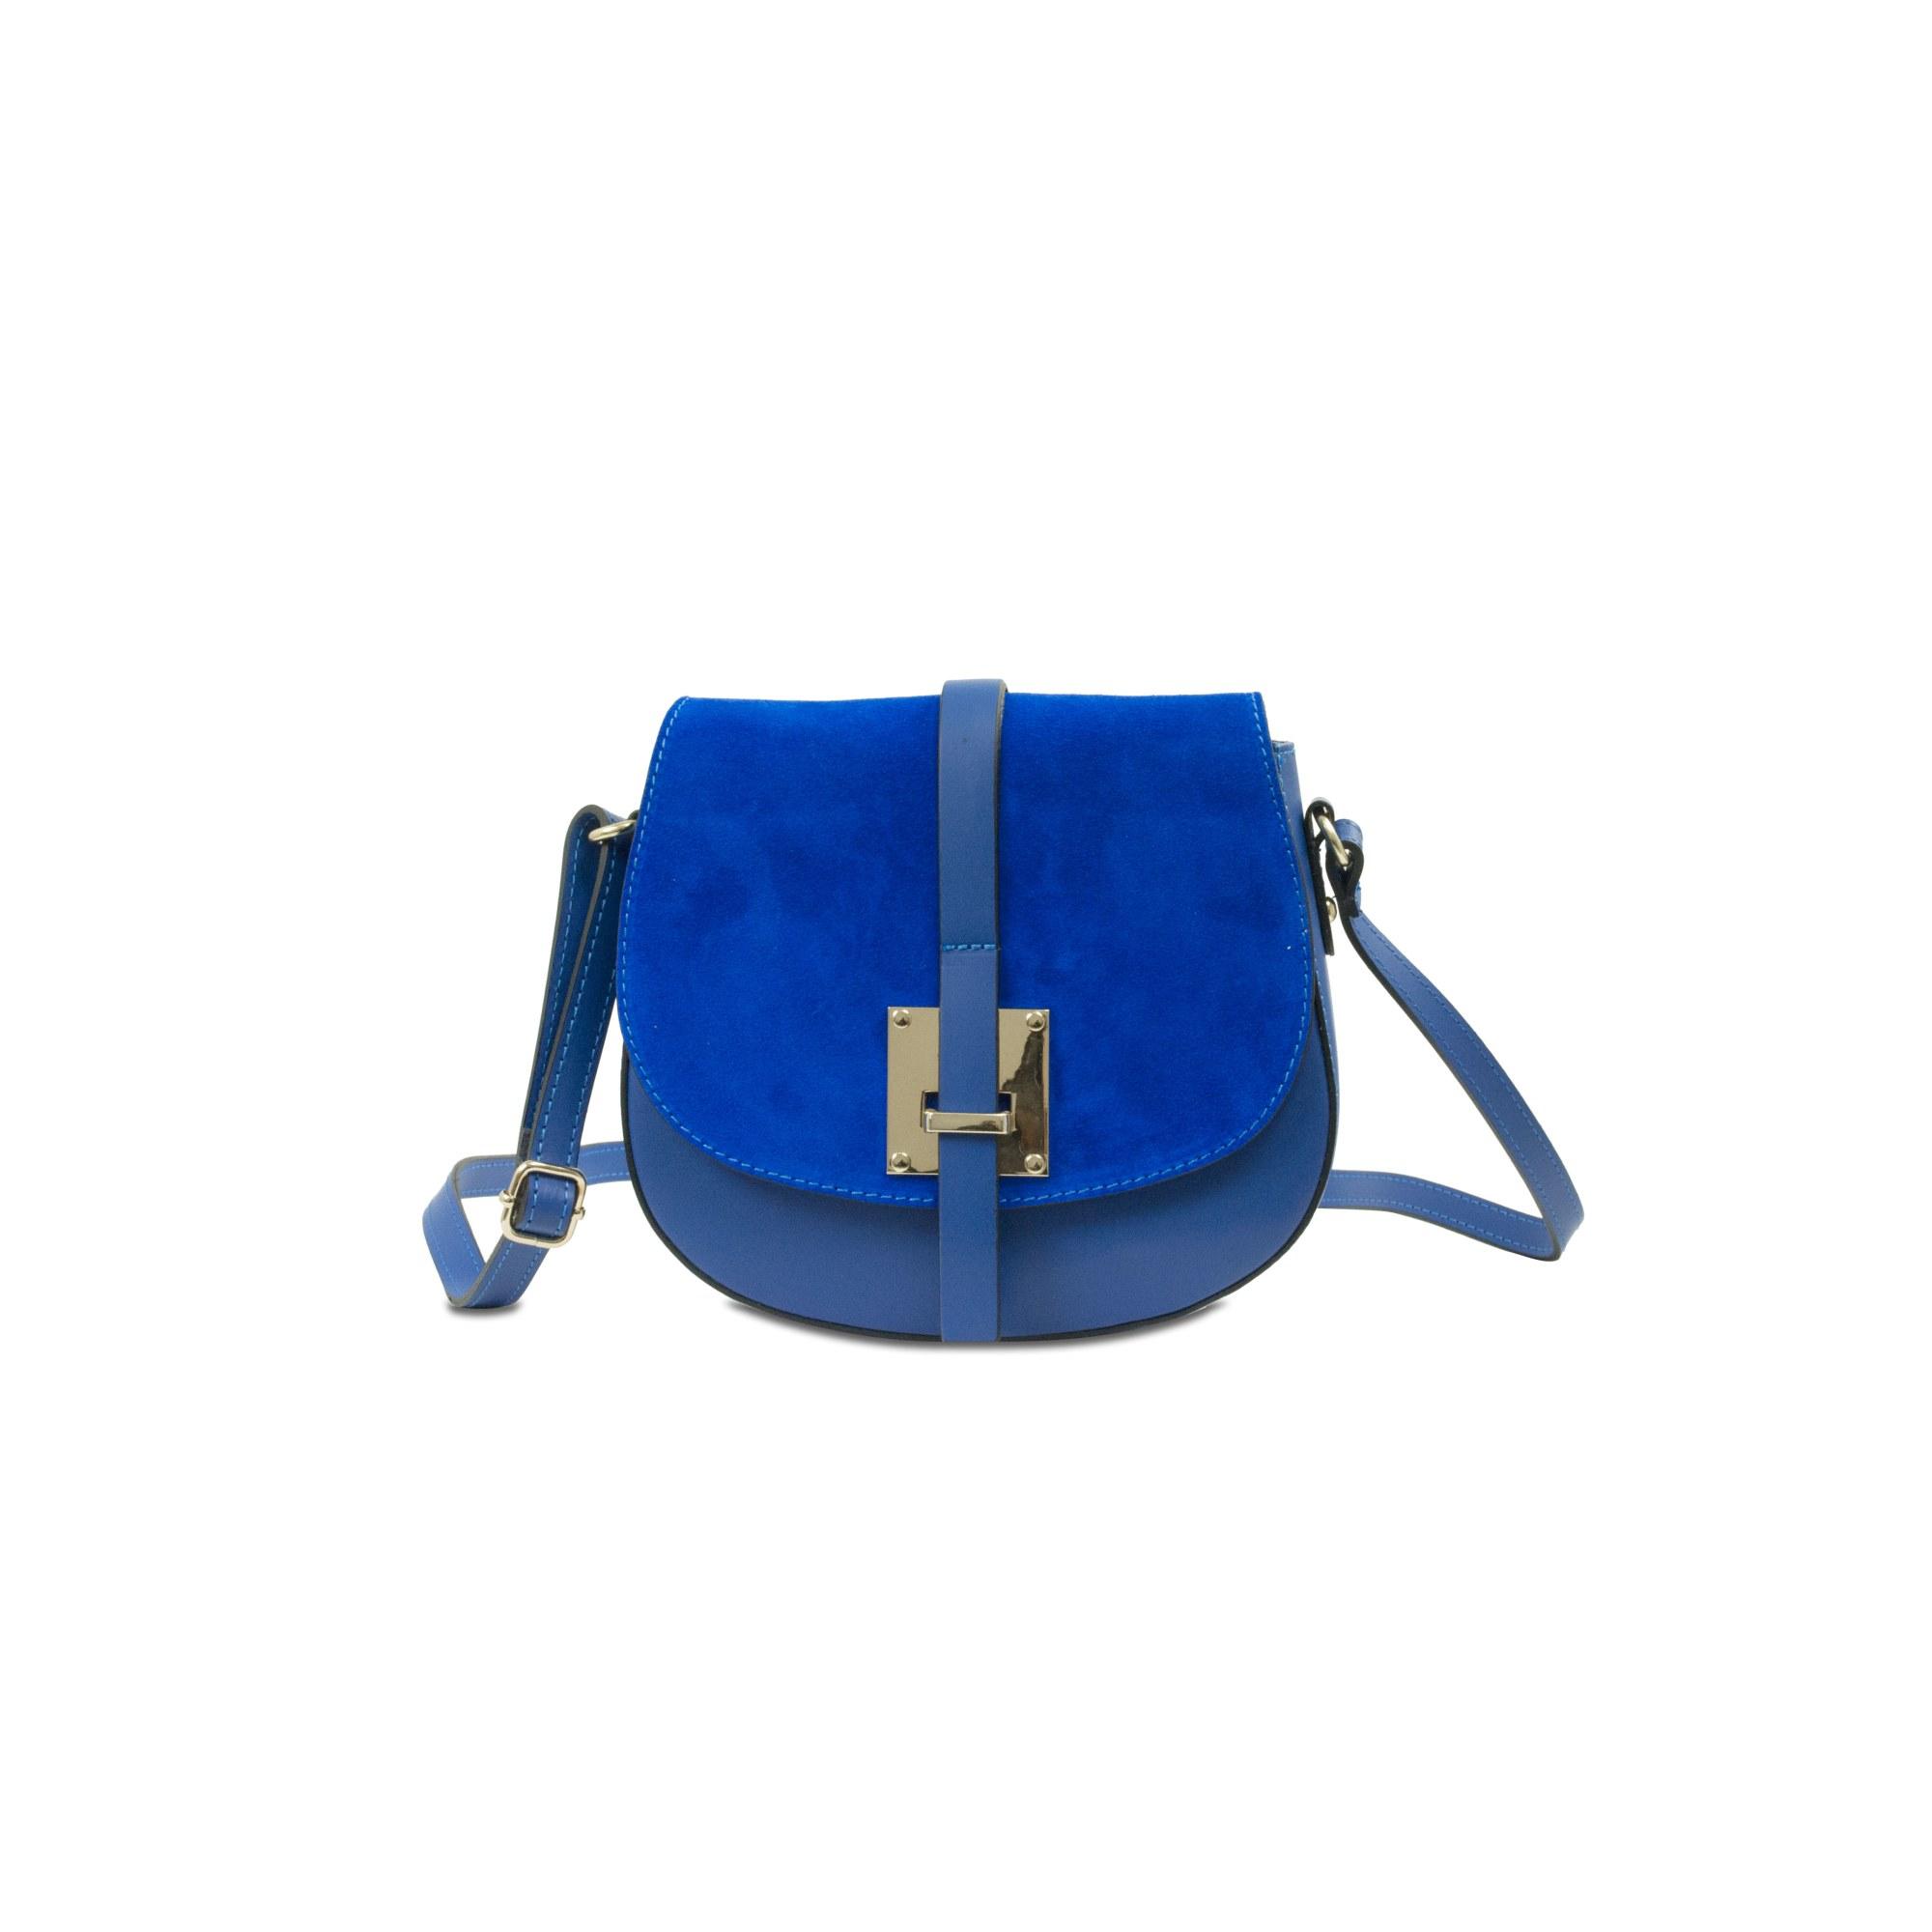 Sac en bandoulière en cuir INFINITIF Bleu, bleu marine, bleu turquoise